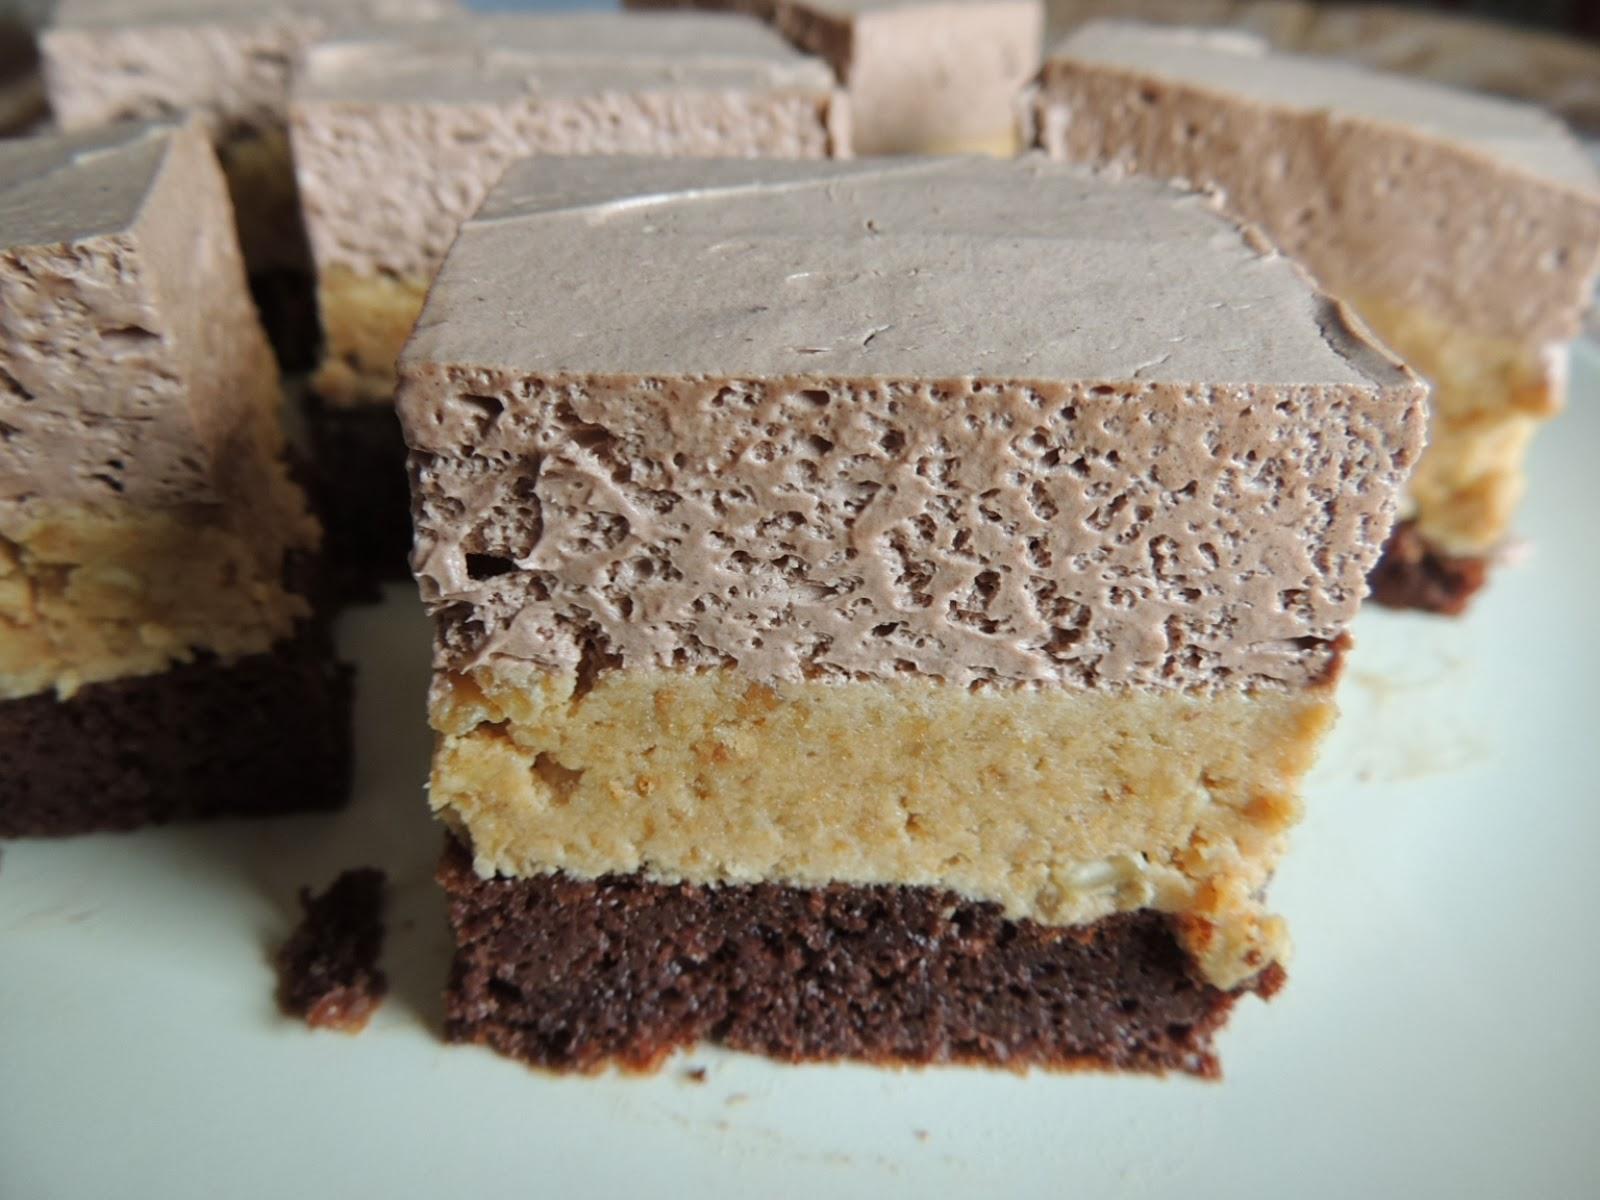 Socni kolac sa kikirikijem, koka-kolom i mlevenim keksom